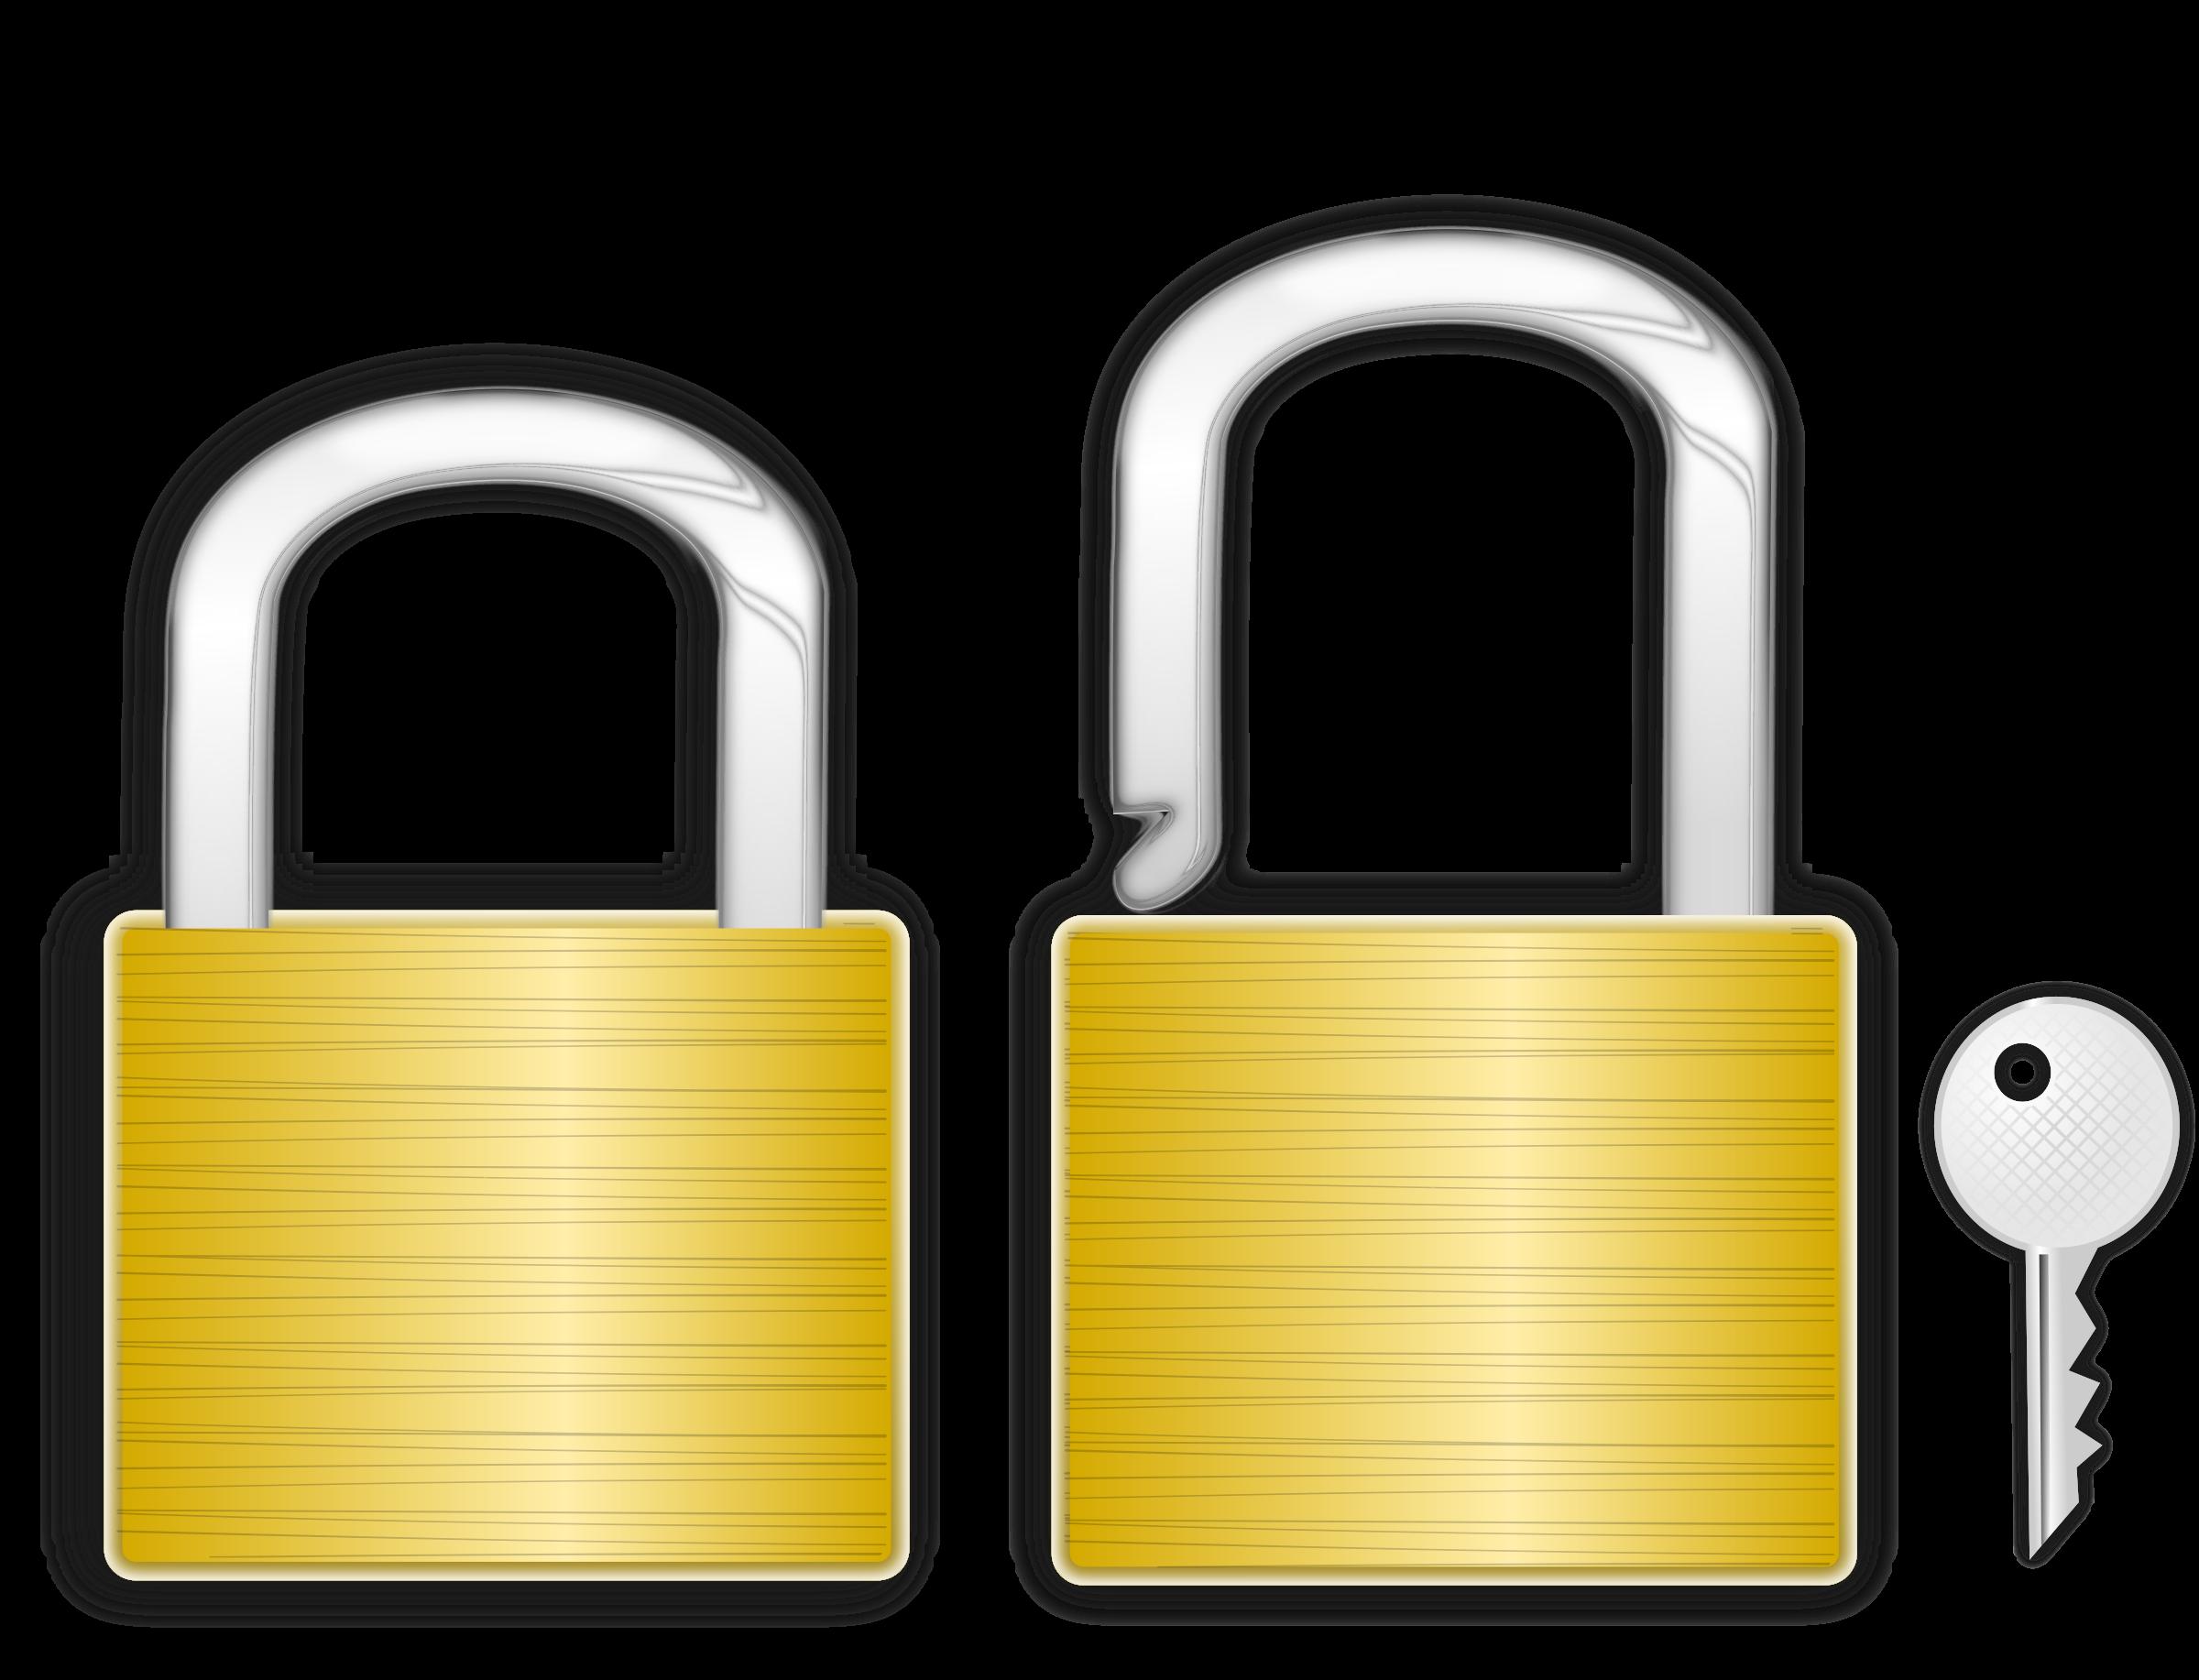 Lock clipart lock and key. Big image png